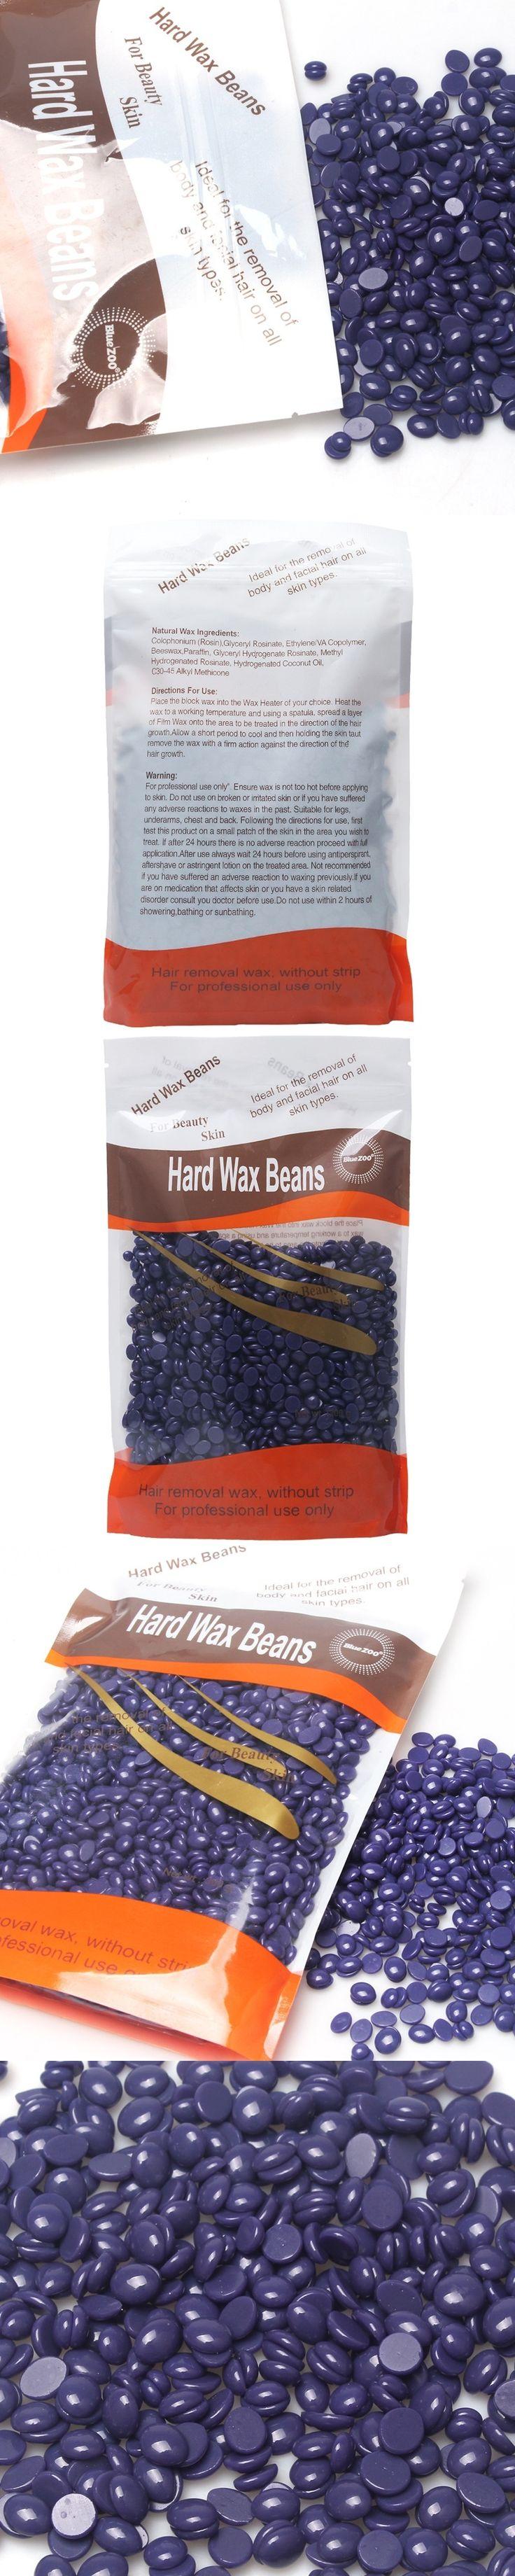 300g Hard Wax Beans No Strip Depilatory Hot Film Hard Wax Pellet Waxing Bikini Hair Removal Bean Lavender Flavour Free Shipping